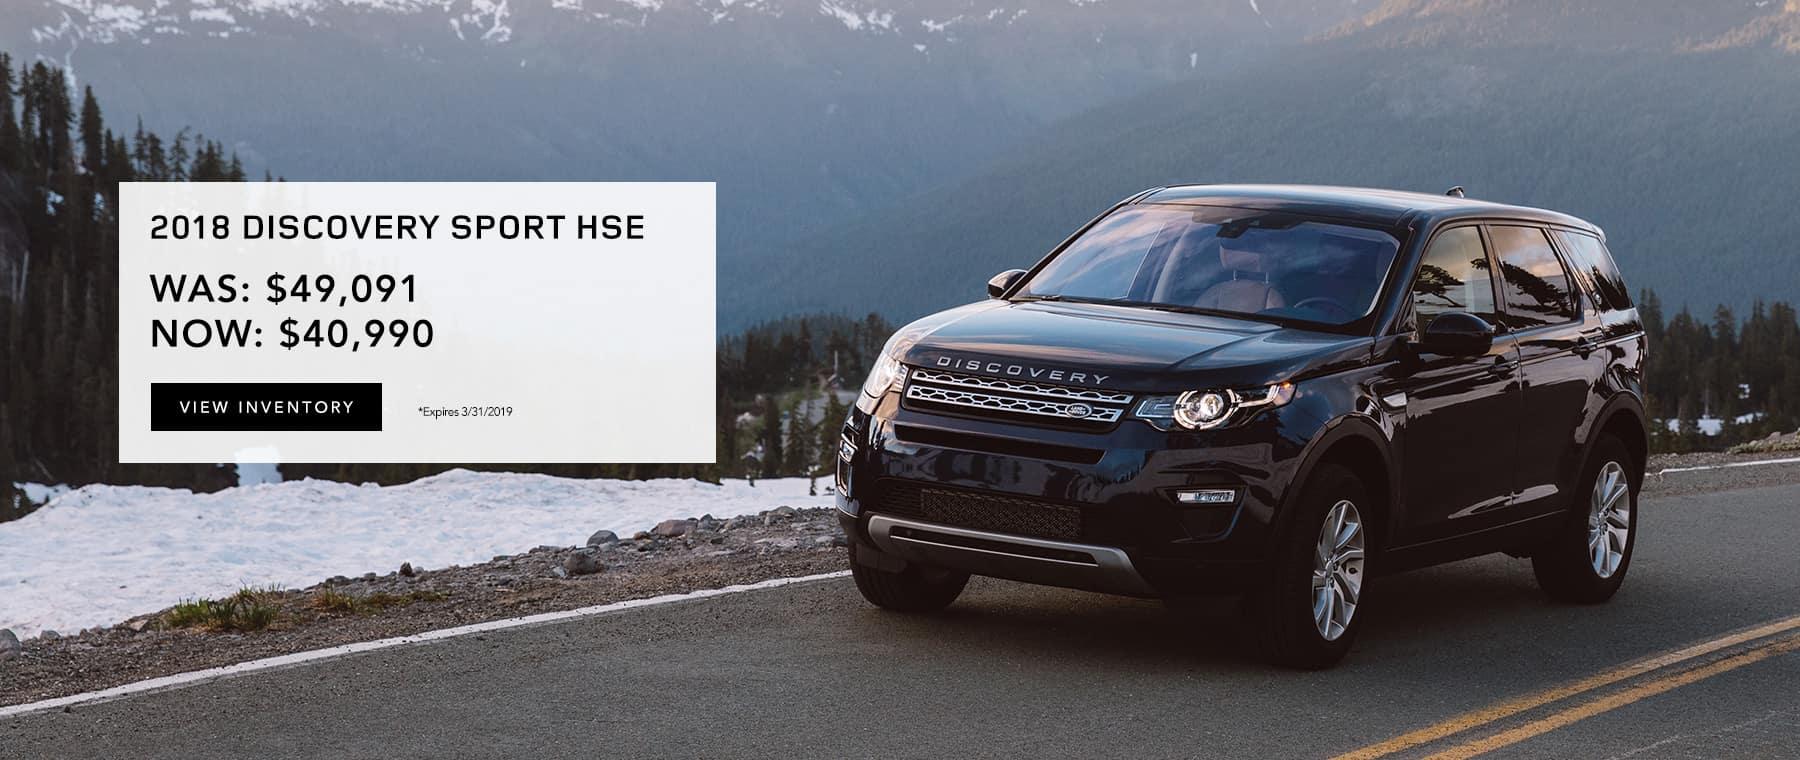 Hornburg Land Rover >> Hornlrsm Sl Hse 1 Hornburg Land Rover Santa Monica